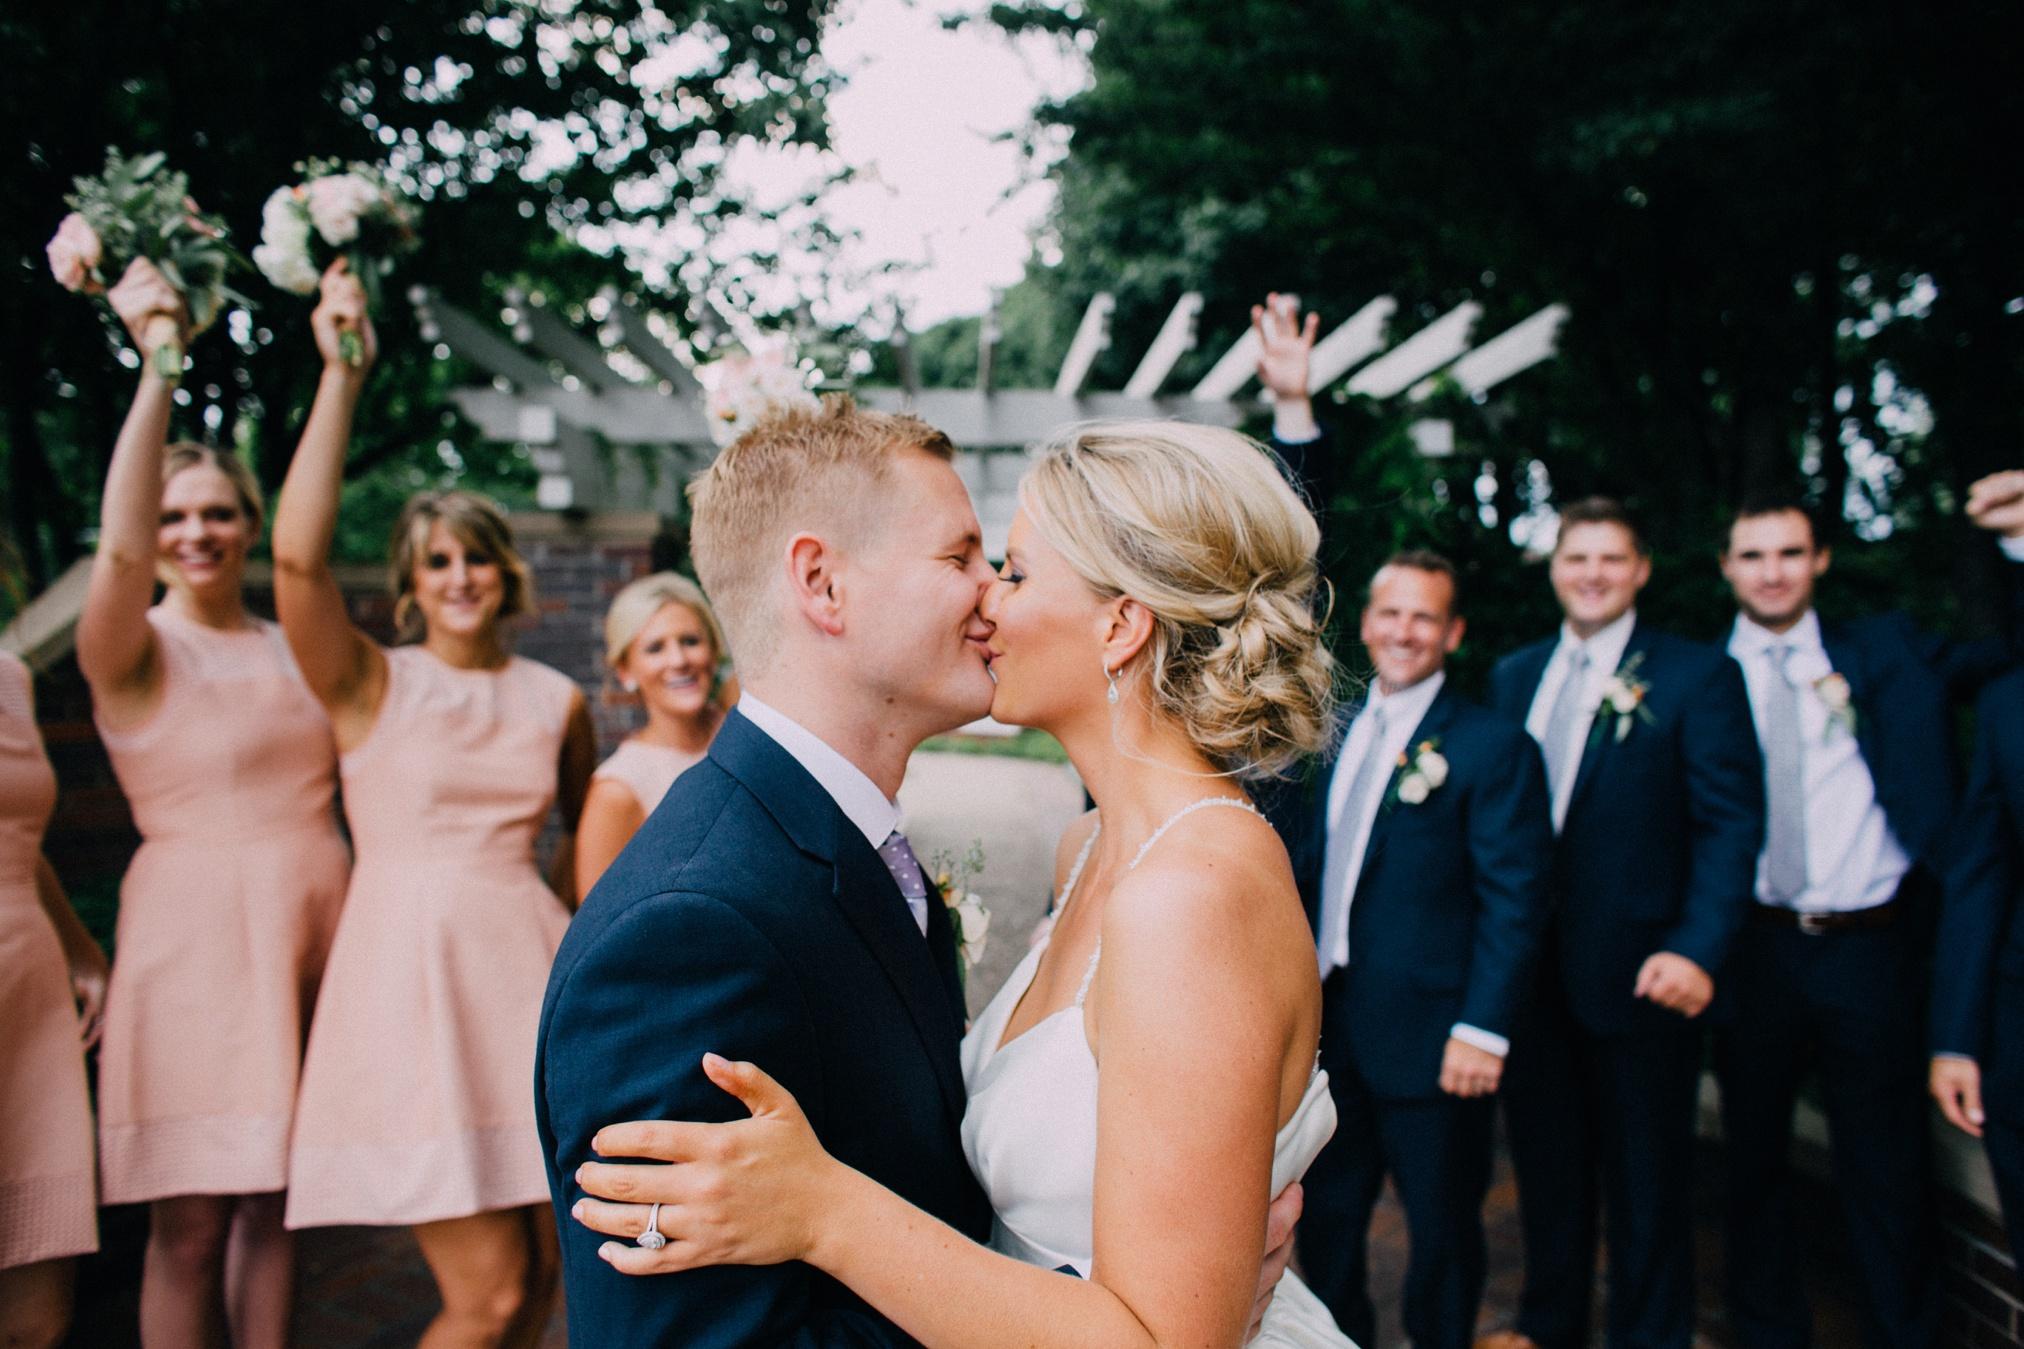 brenna+michael_wedding-512.jpg